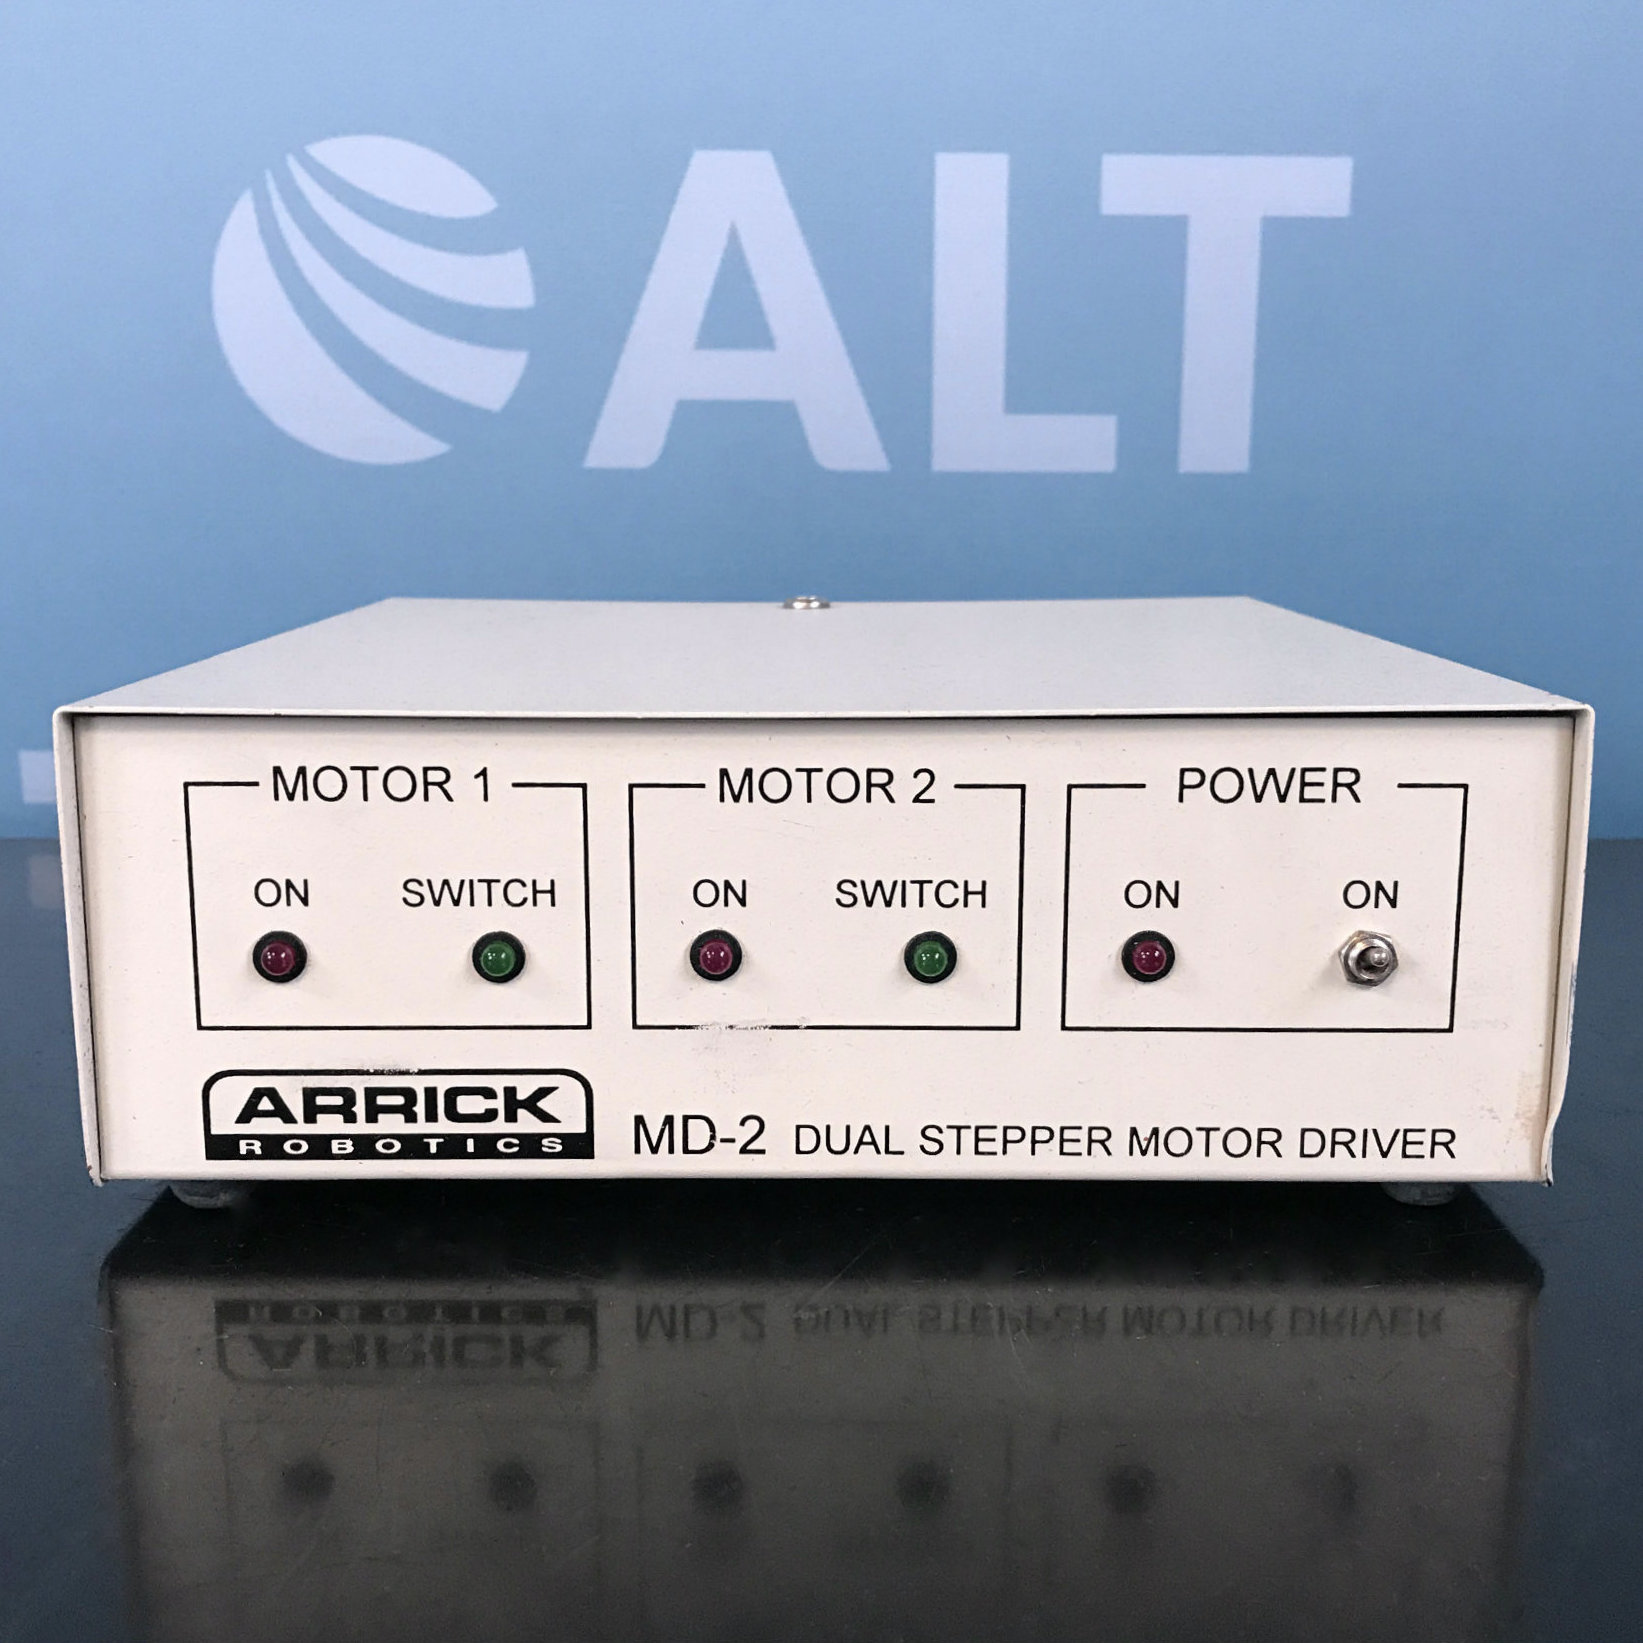 Arrick Robotics MD2 Dual Stepper Motor System Image